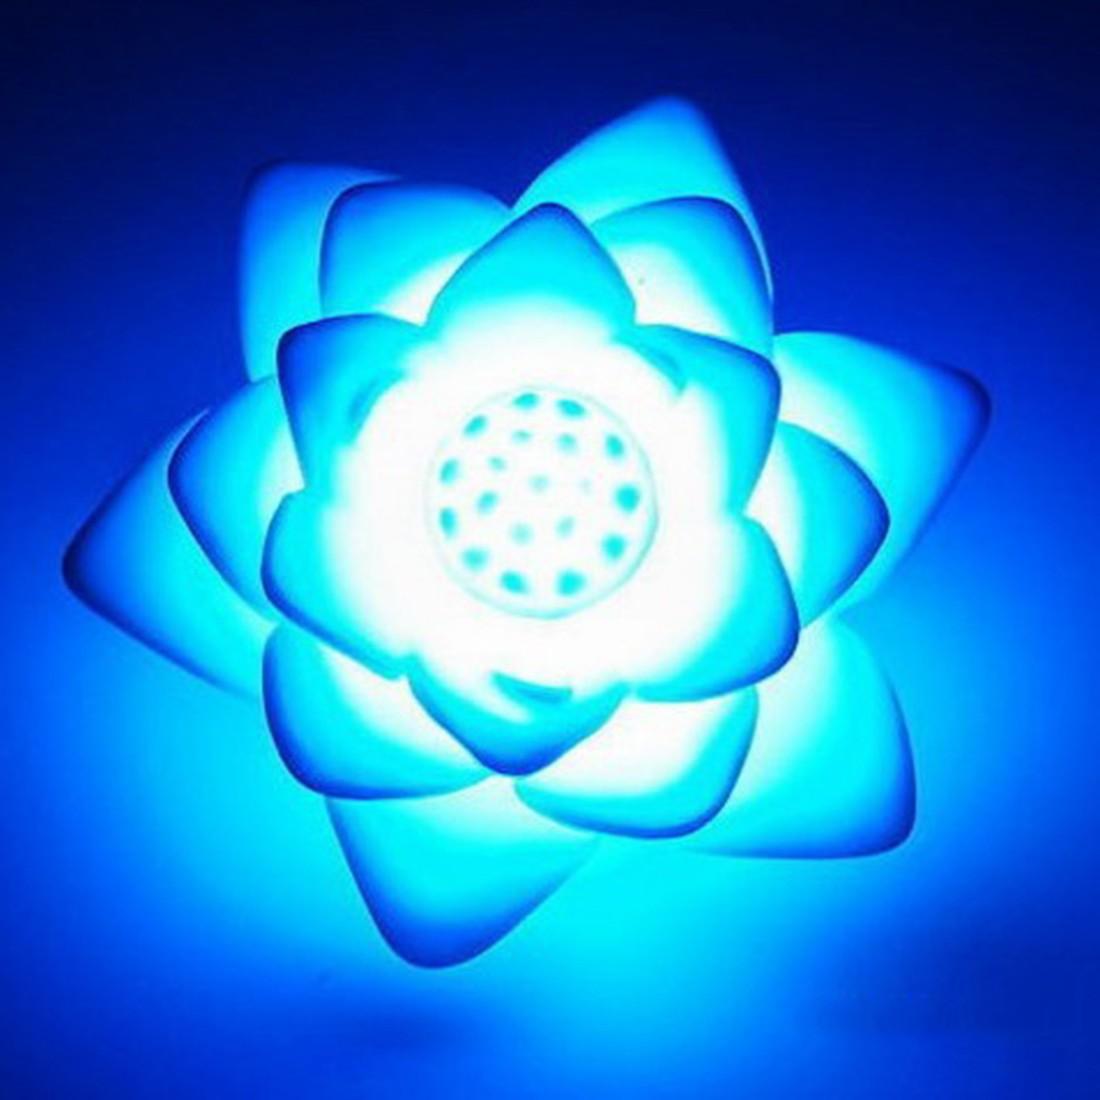 Lámpara de noche LED romántica Rosa flor luz de noche Color cambiado lámpara LED luces de noche diseño Interior